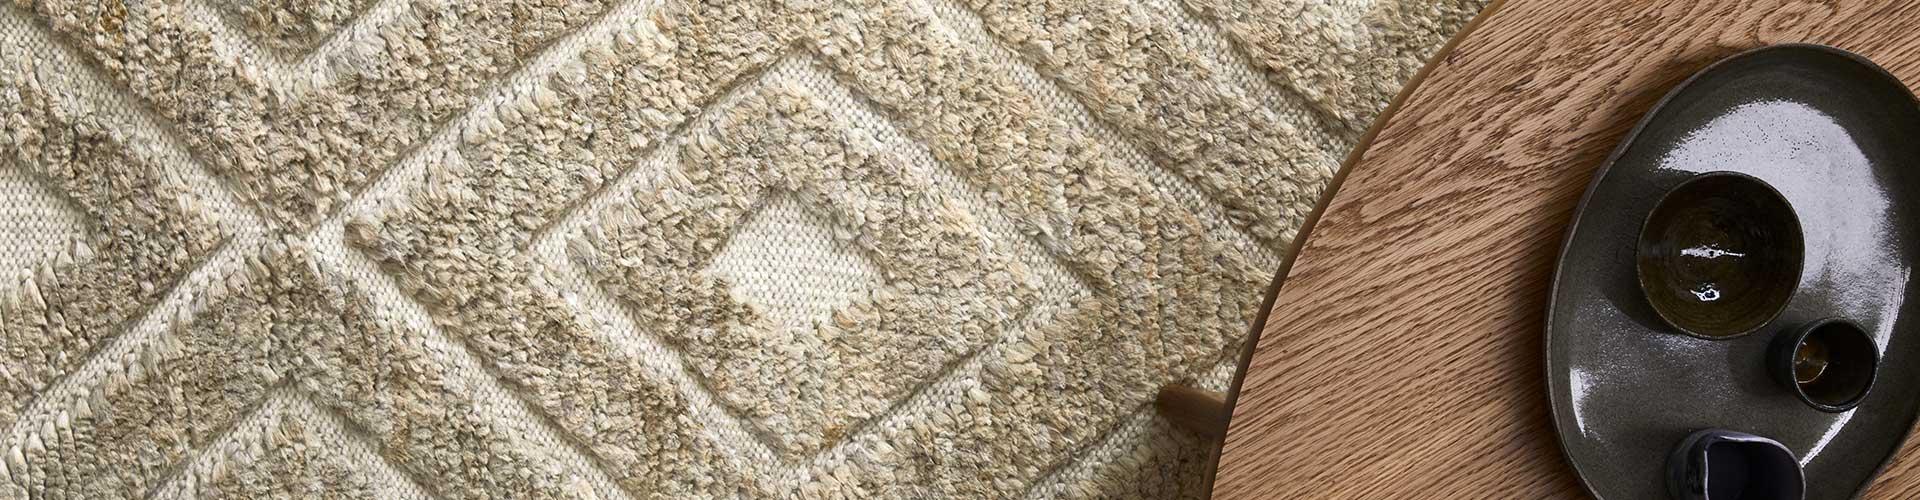 RM Living Cincinnati Interior Design Contemporary Floor Coverings and Rugs by Armadillo Armadillo3